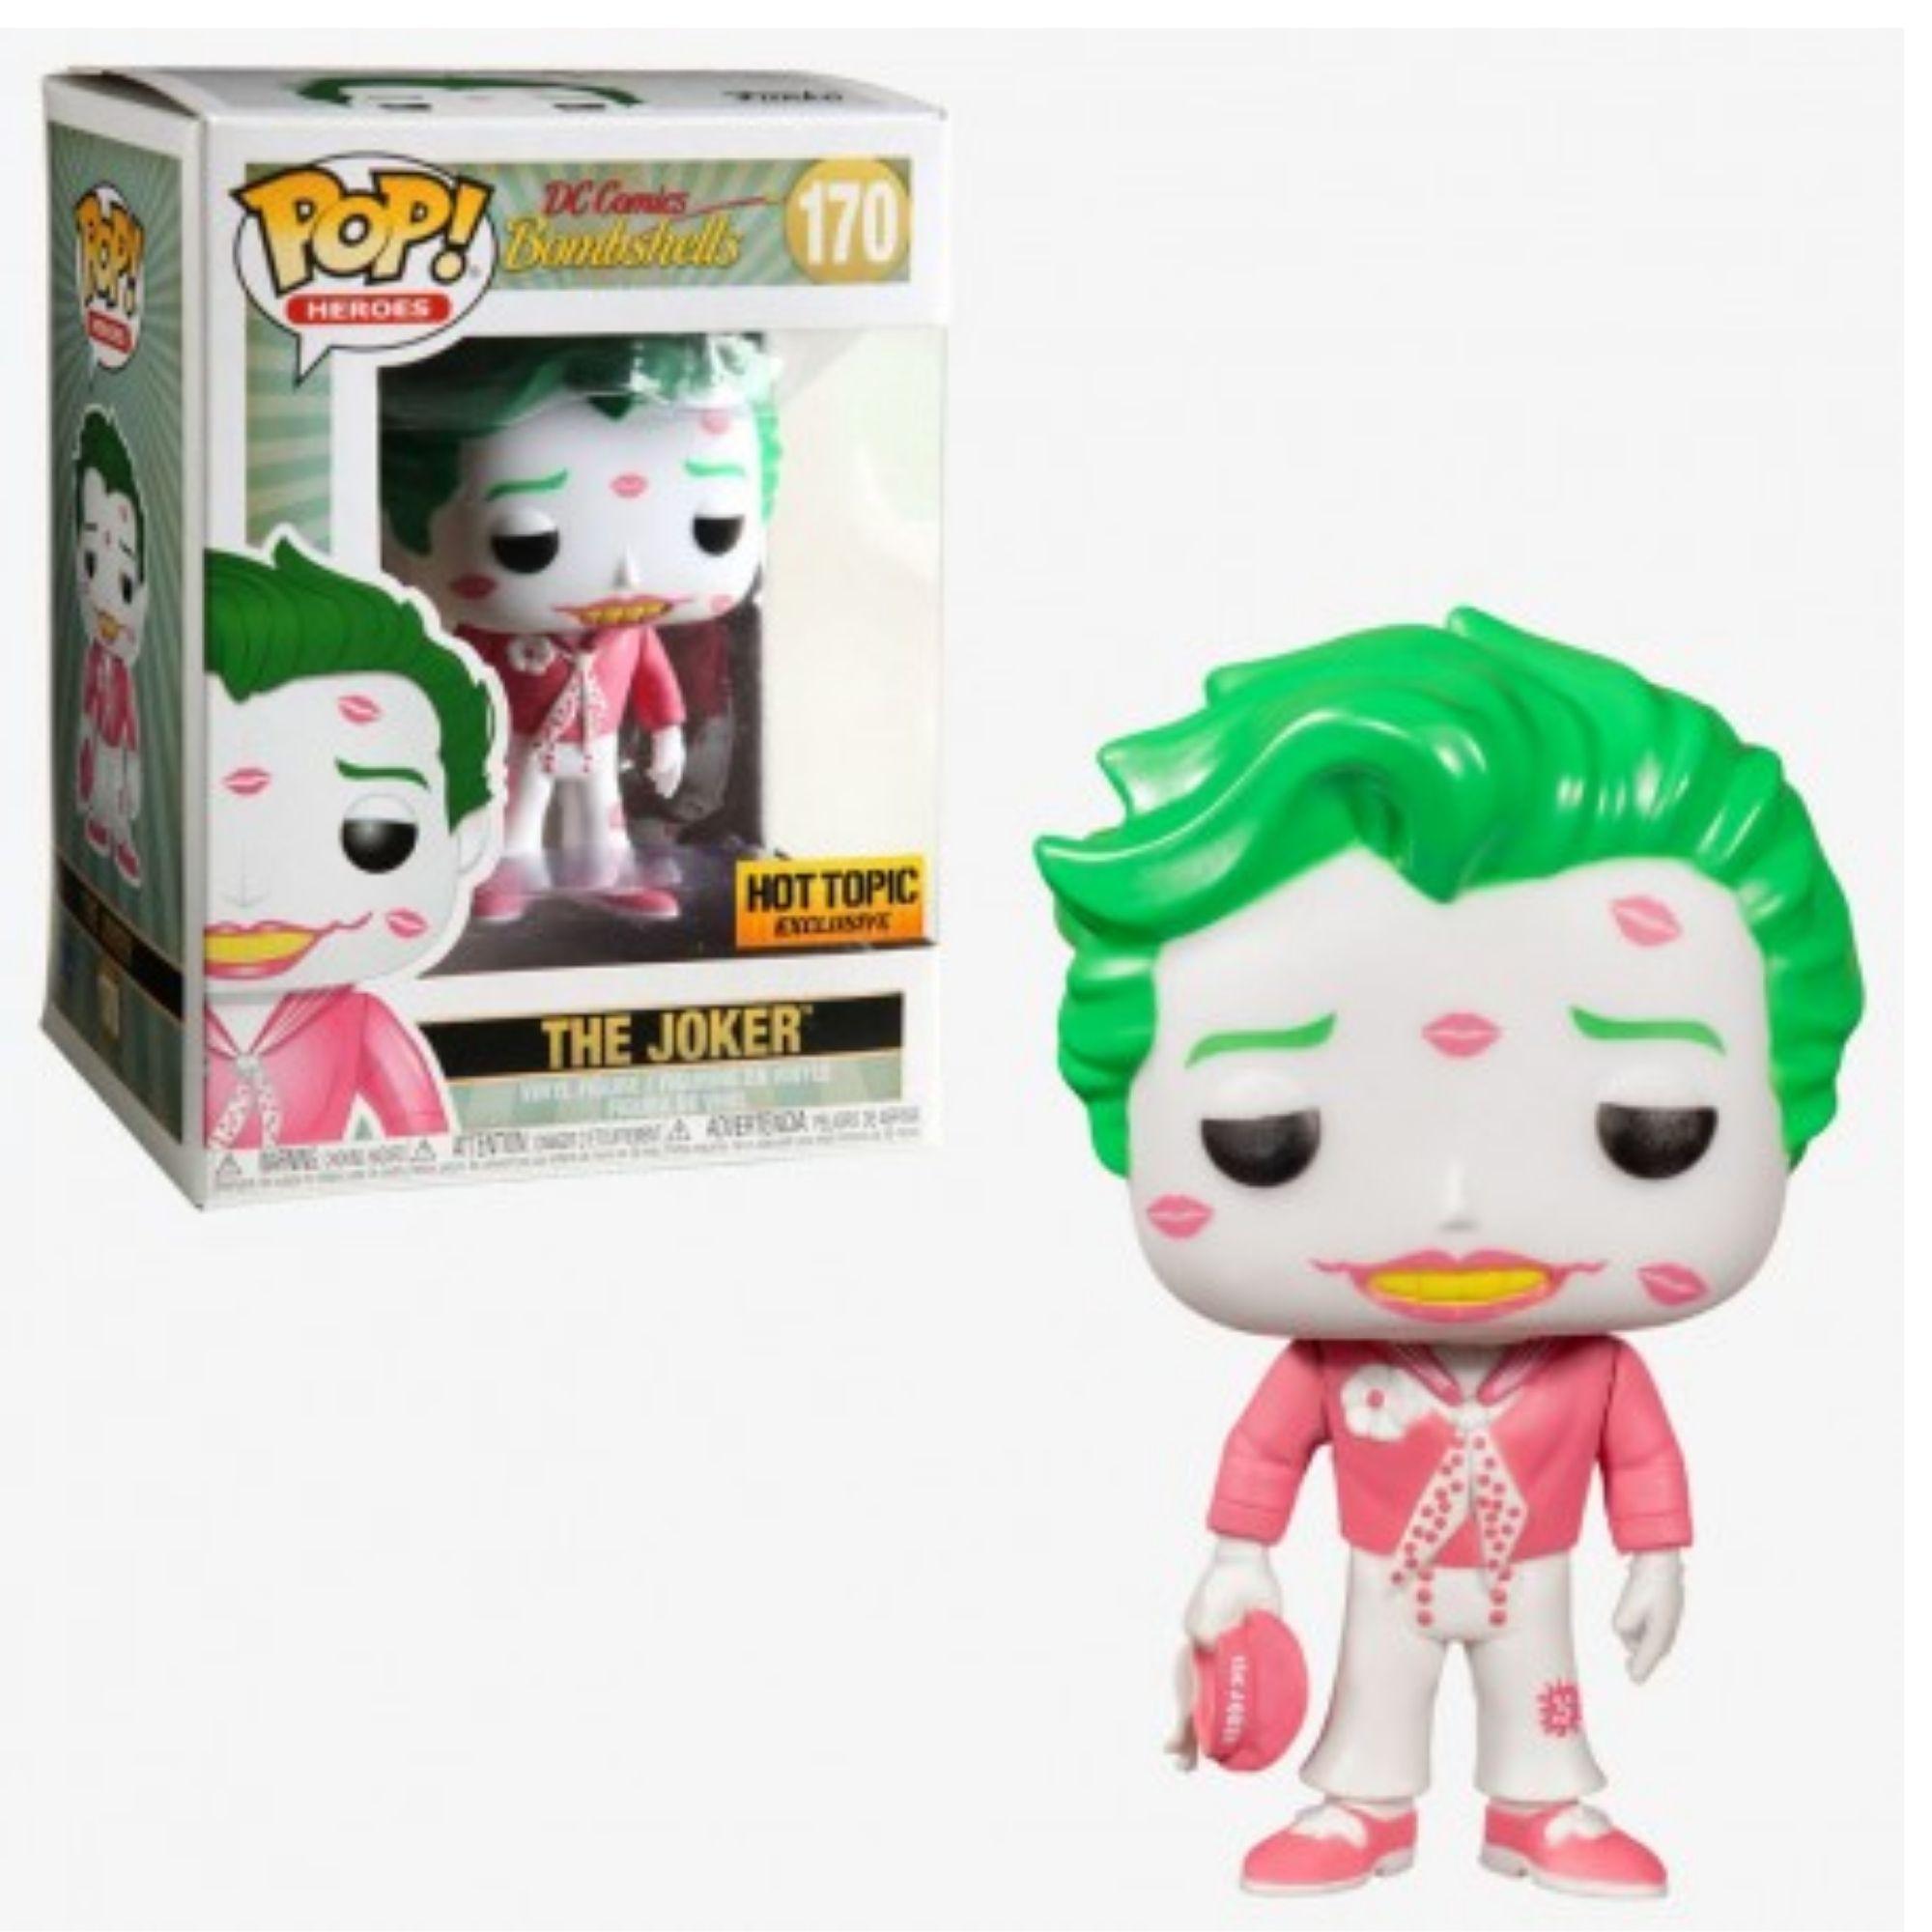 Boneco Funko Pop The Joker Coringa Bombshells Hot Topic #170  - Game Land Brinquedos